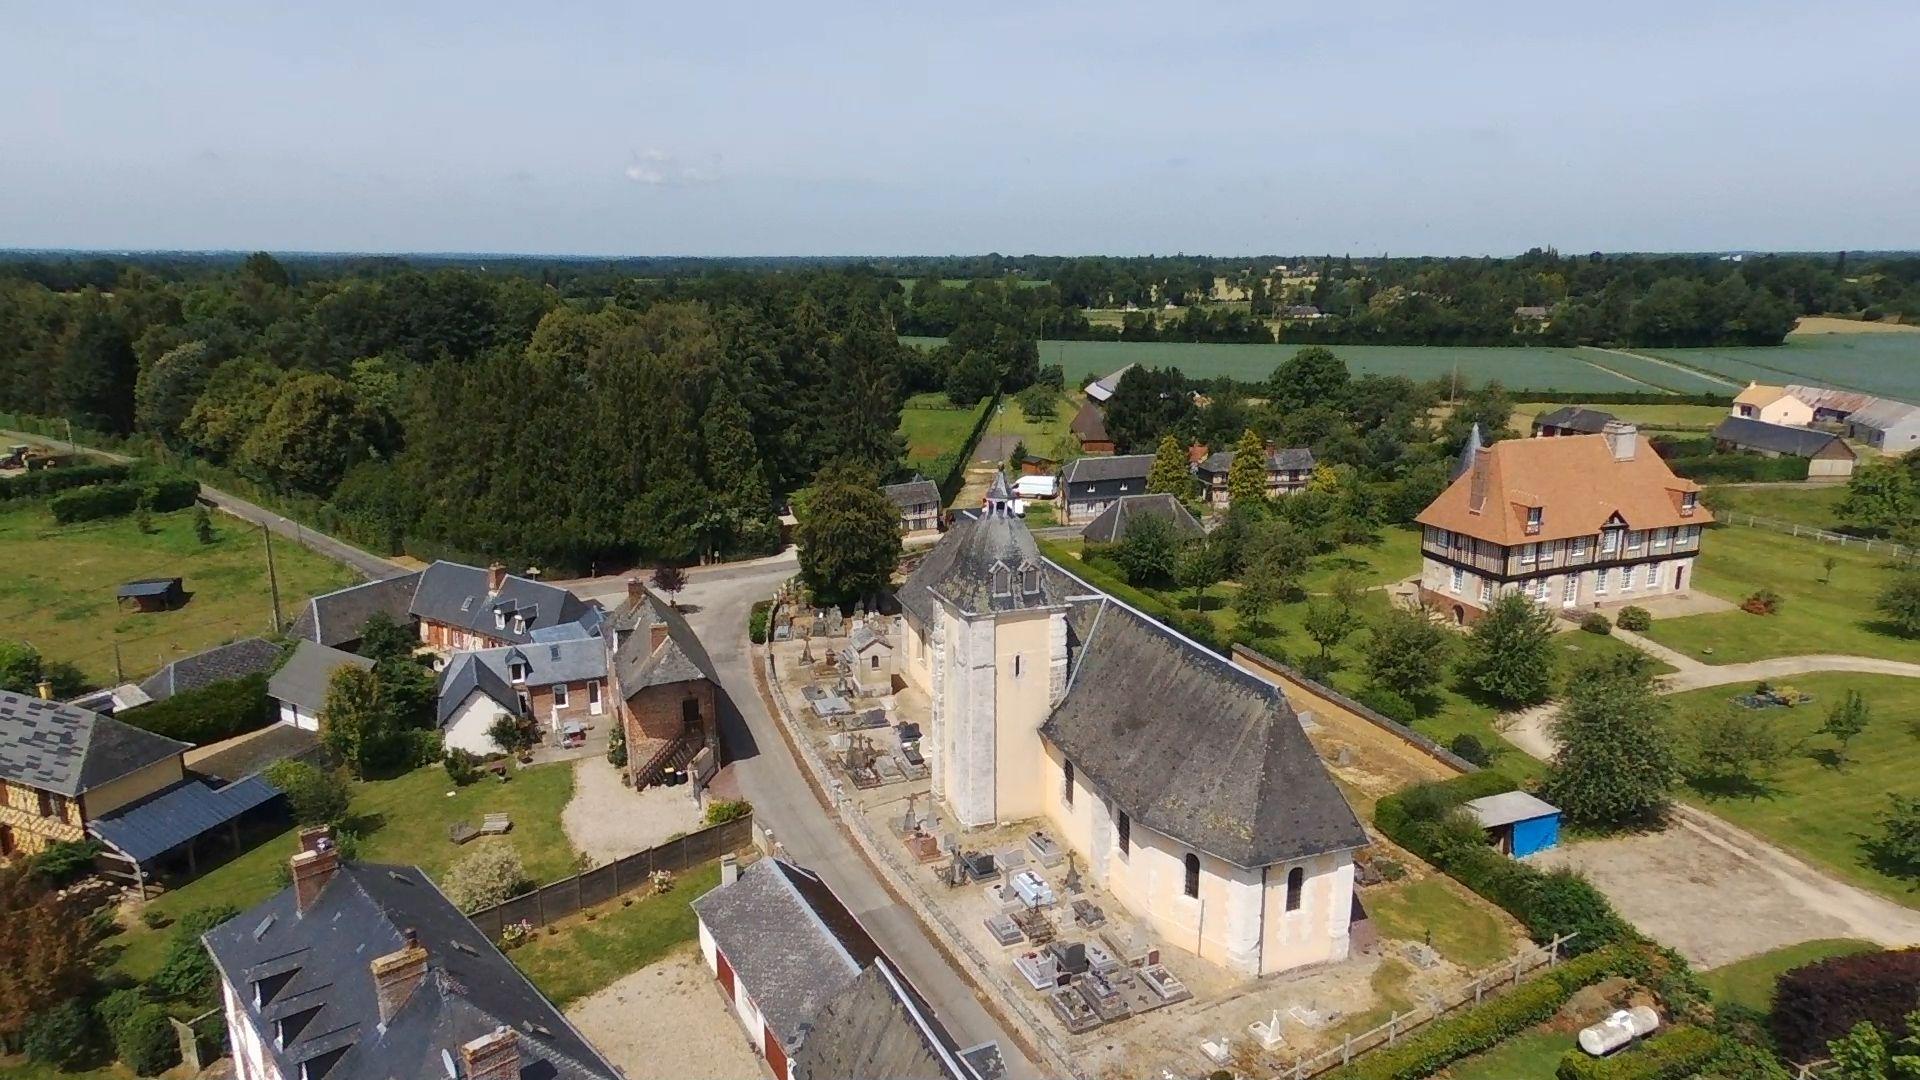 Eglise Saint-Saturnin de Piencourt